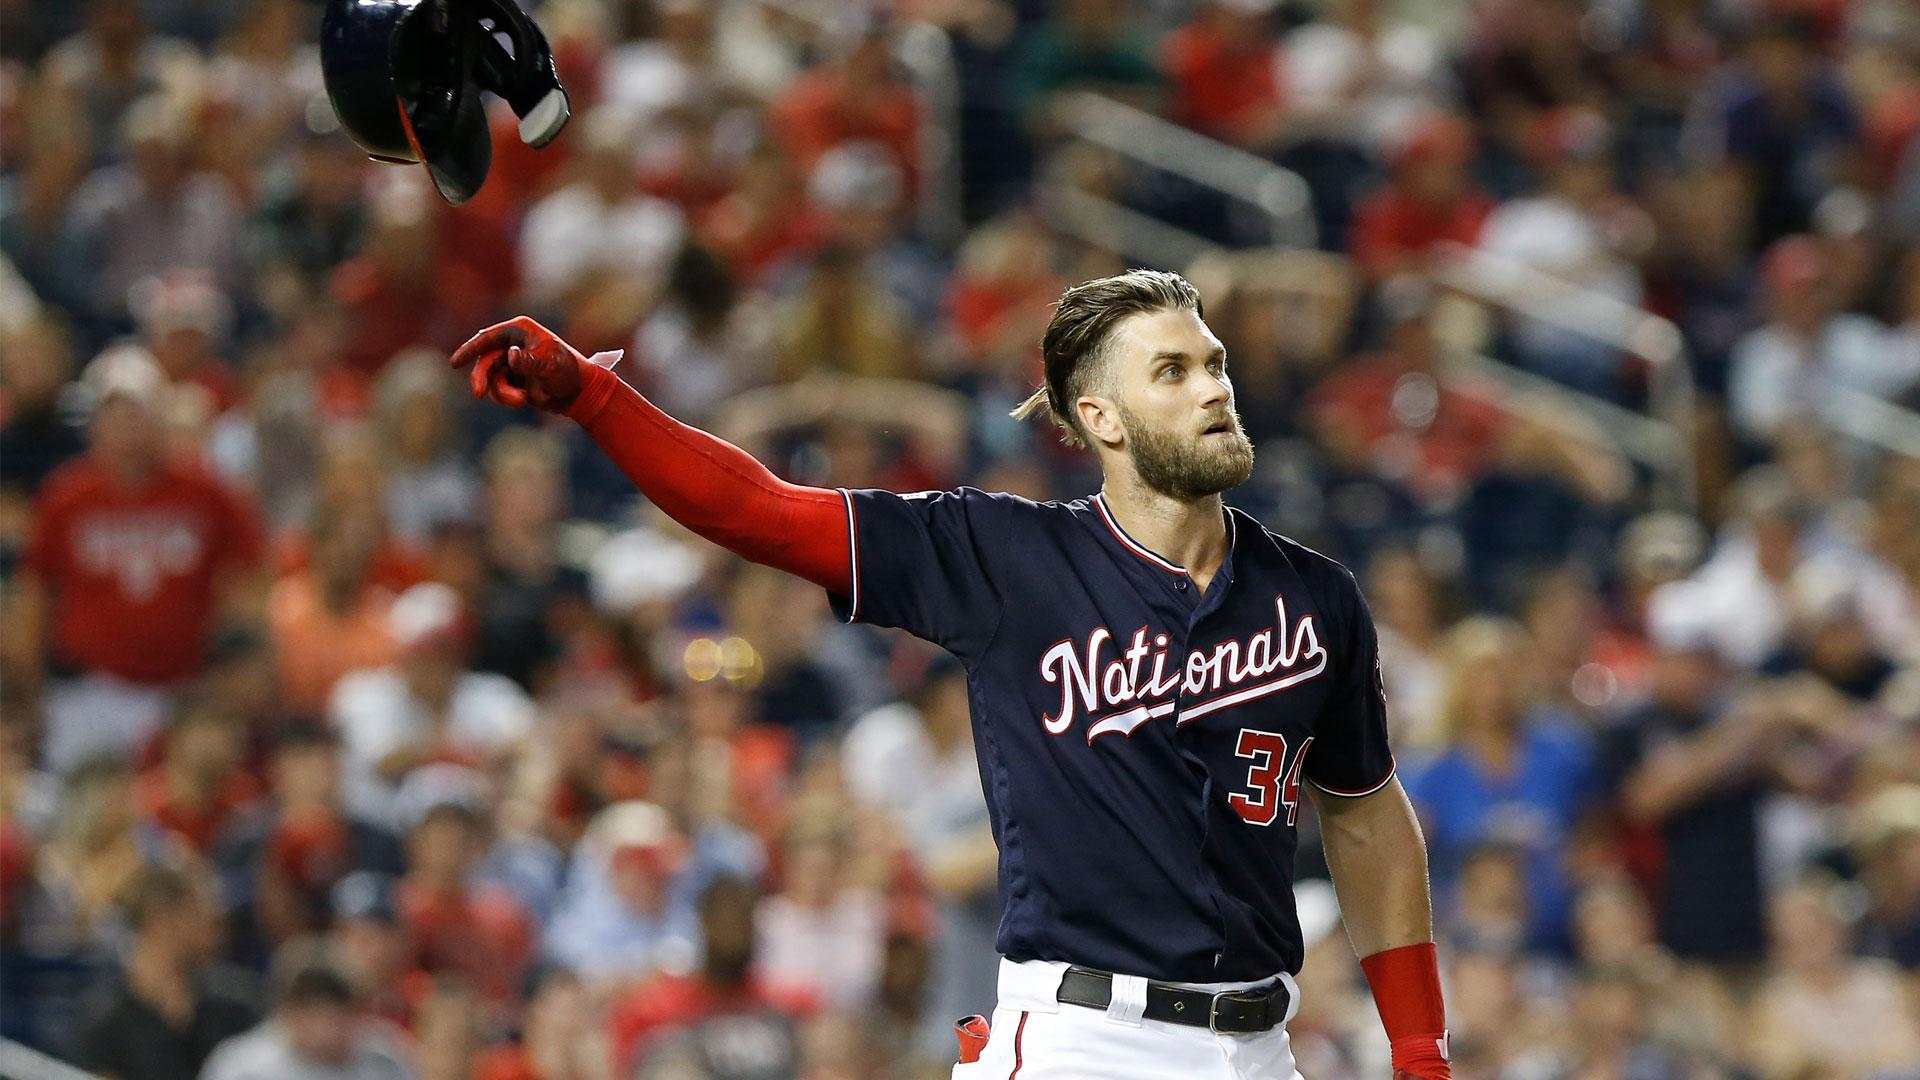 MLB rumors: Bryce Harper has made his decision, says D.C. radio host